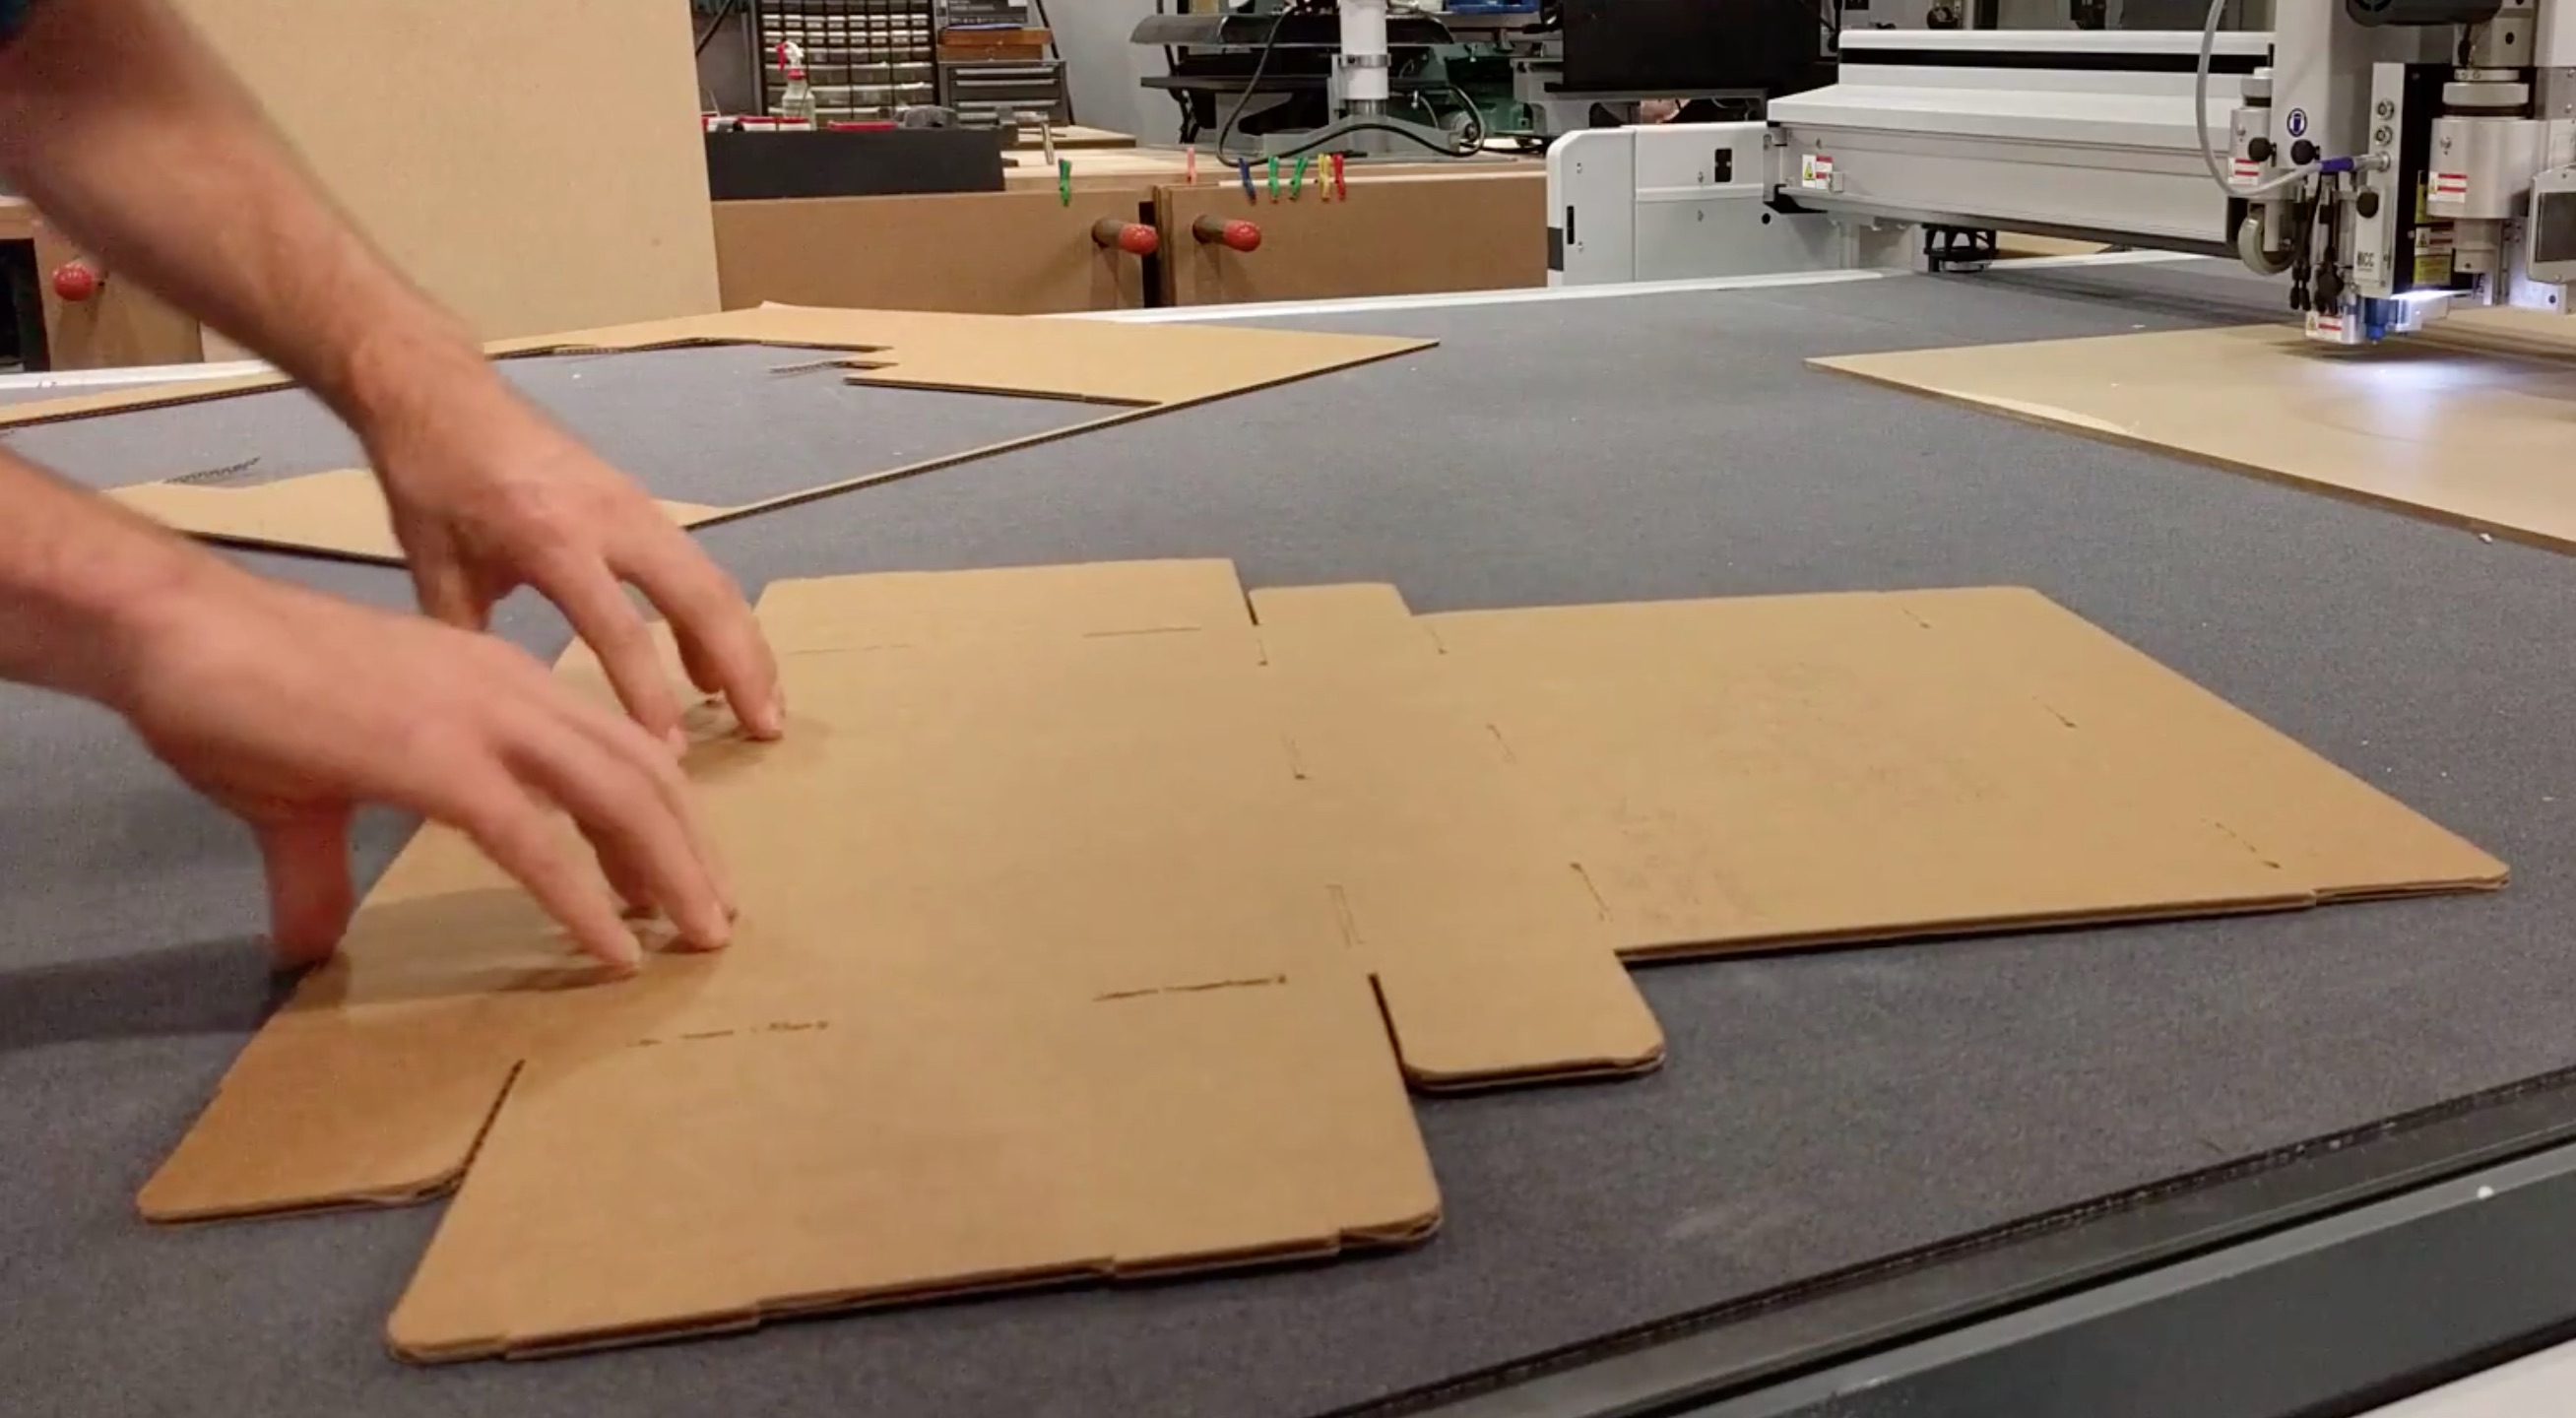 img/cardboard-1.jpg